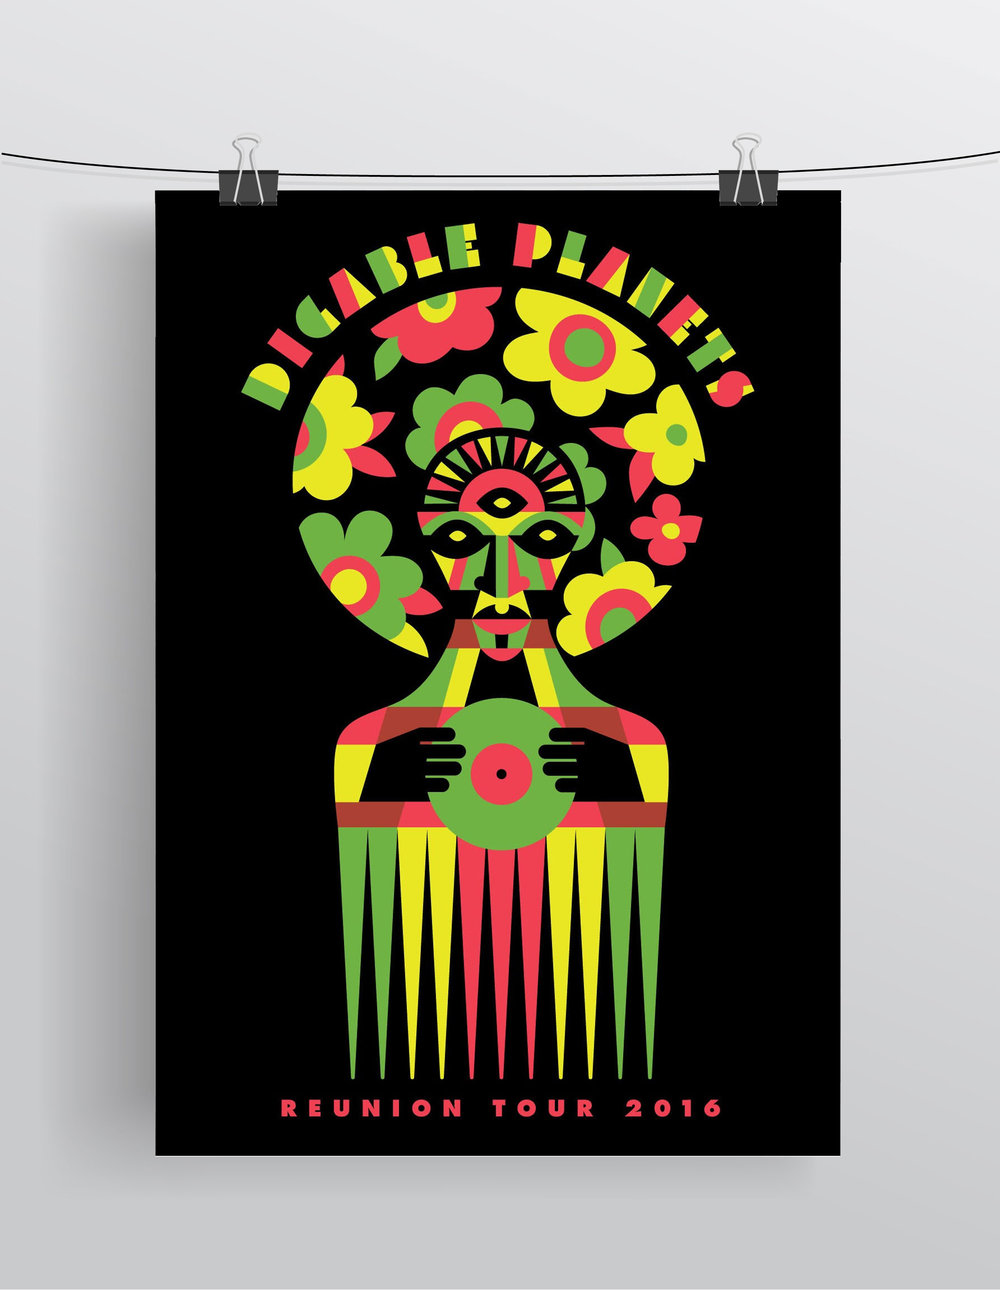 digable-planets-reunion-tour-poster